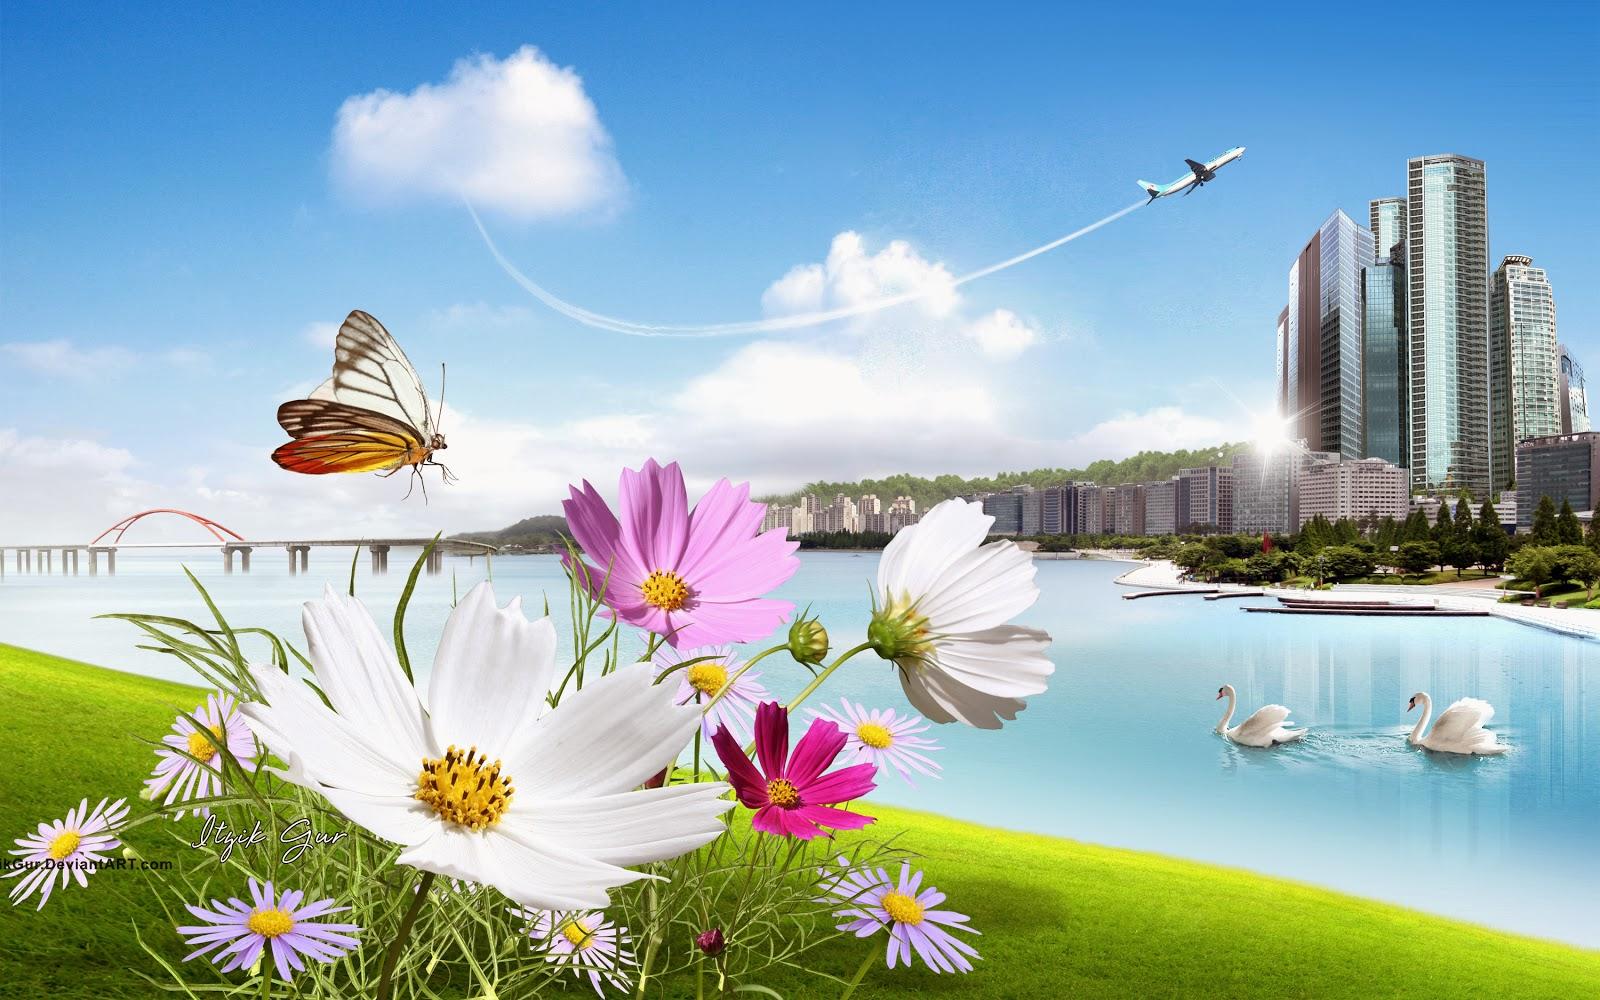 Urban Scenery Psd File - Luckystudio4u